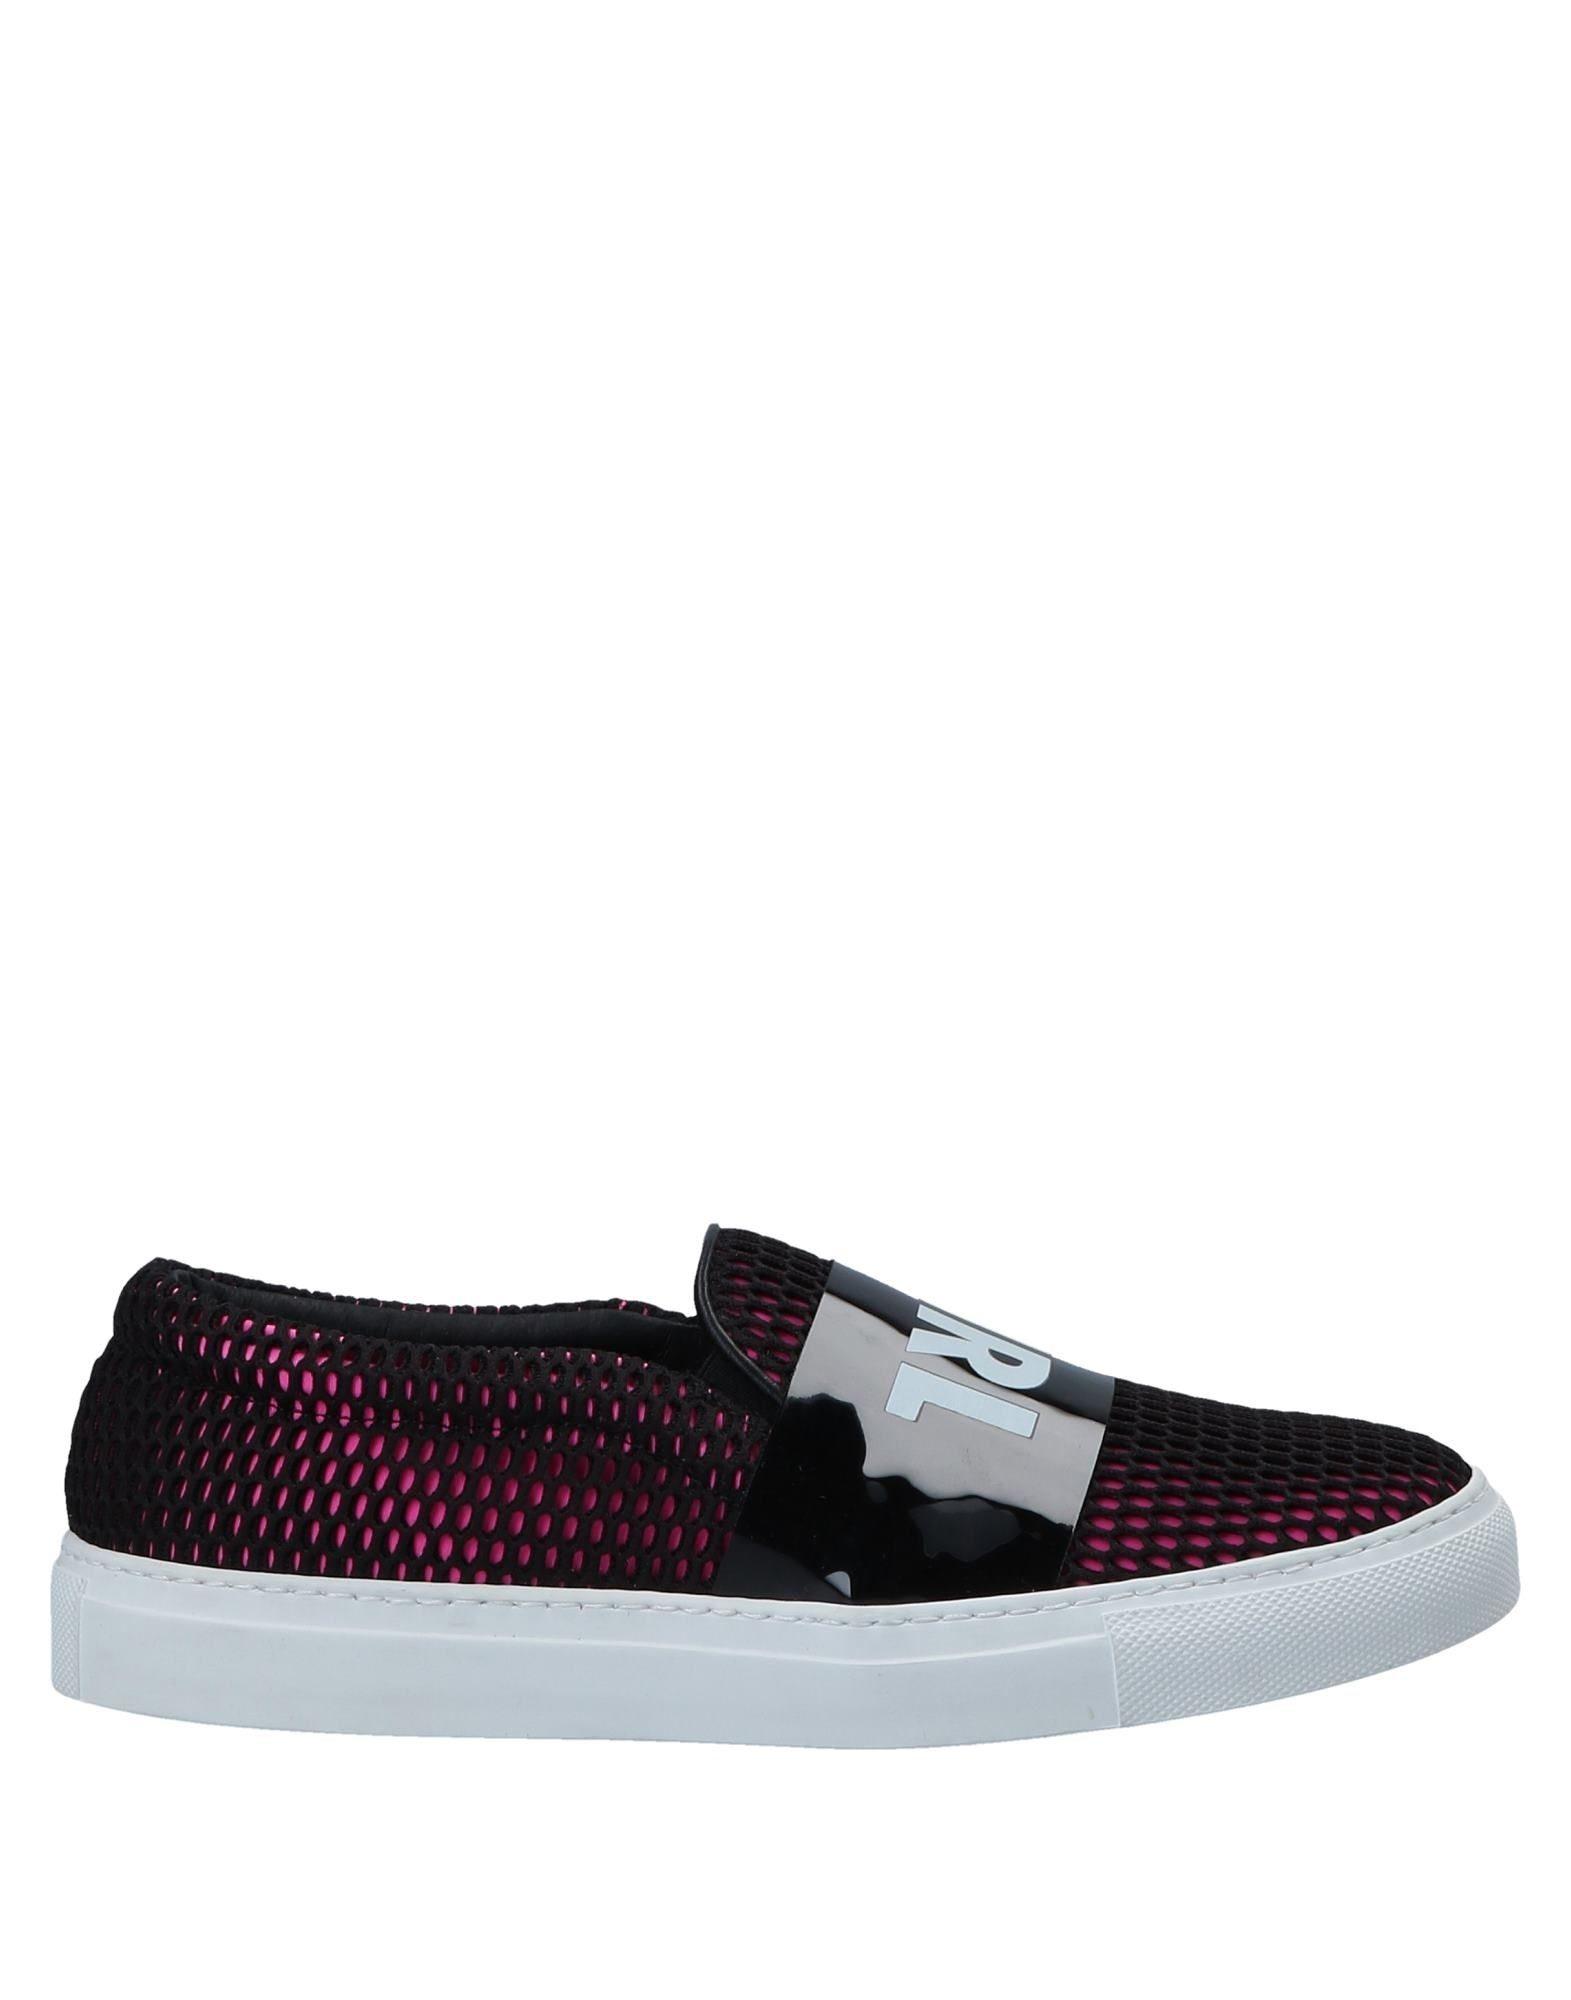 Stilvolle billige Schuhe Damen Joshua Sanders Sneakers Damen Schuhe  11558538EQ 9ae0ab